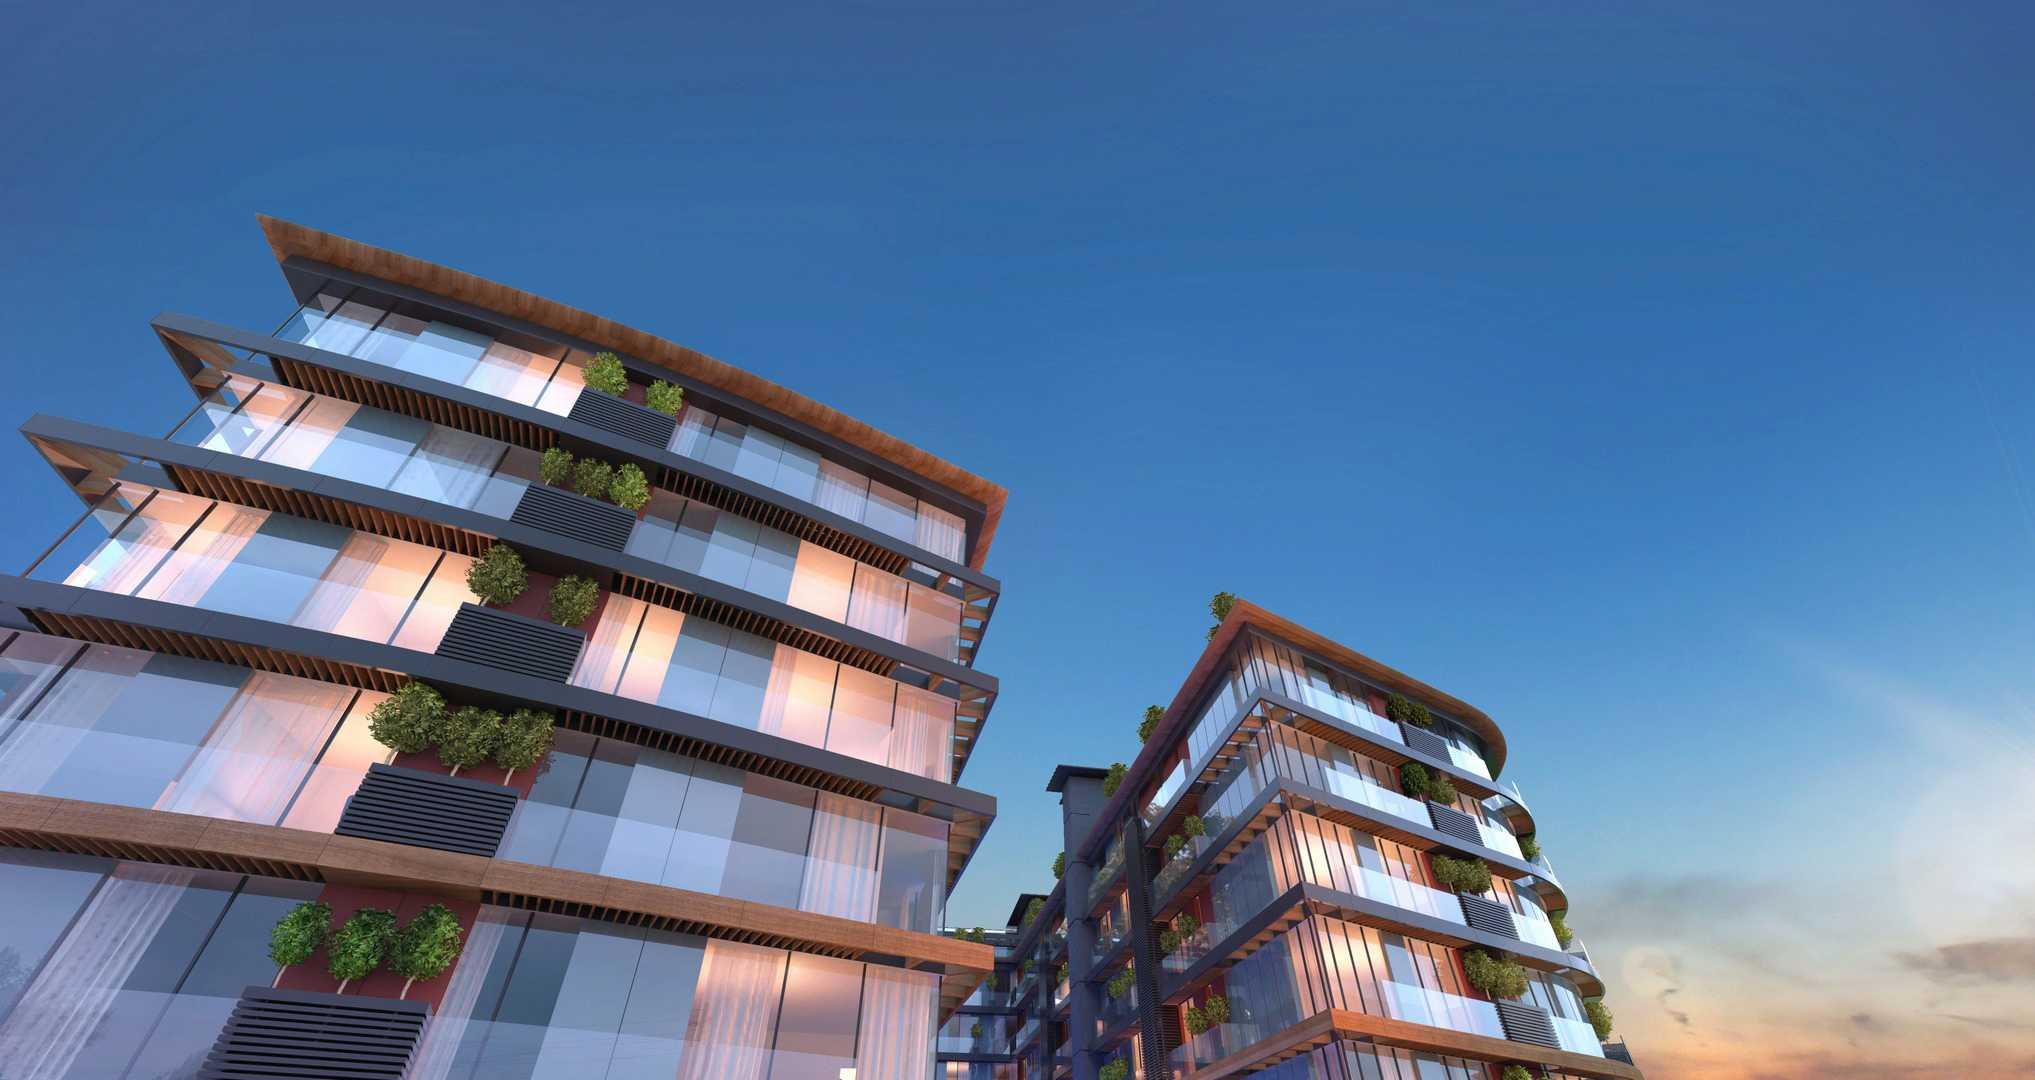 Ready Apartments for Sale near Taksim Square in Beyoğlu-Istanbul